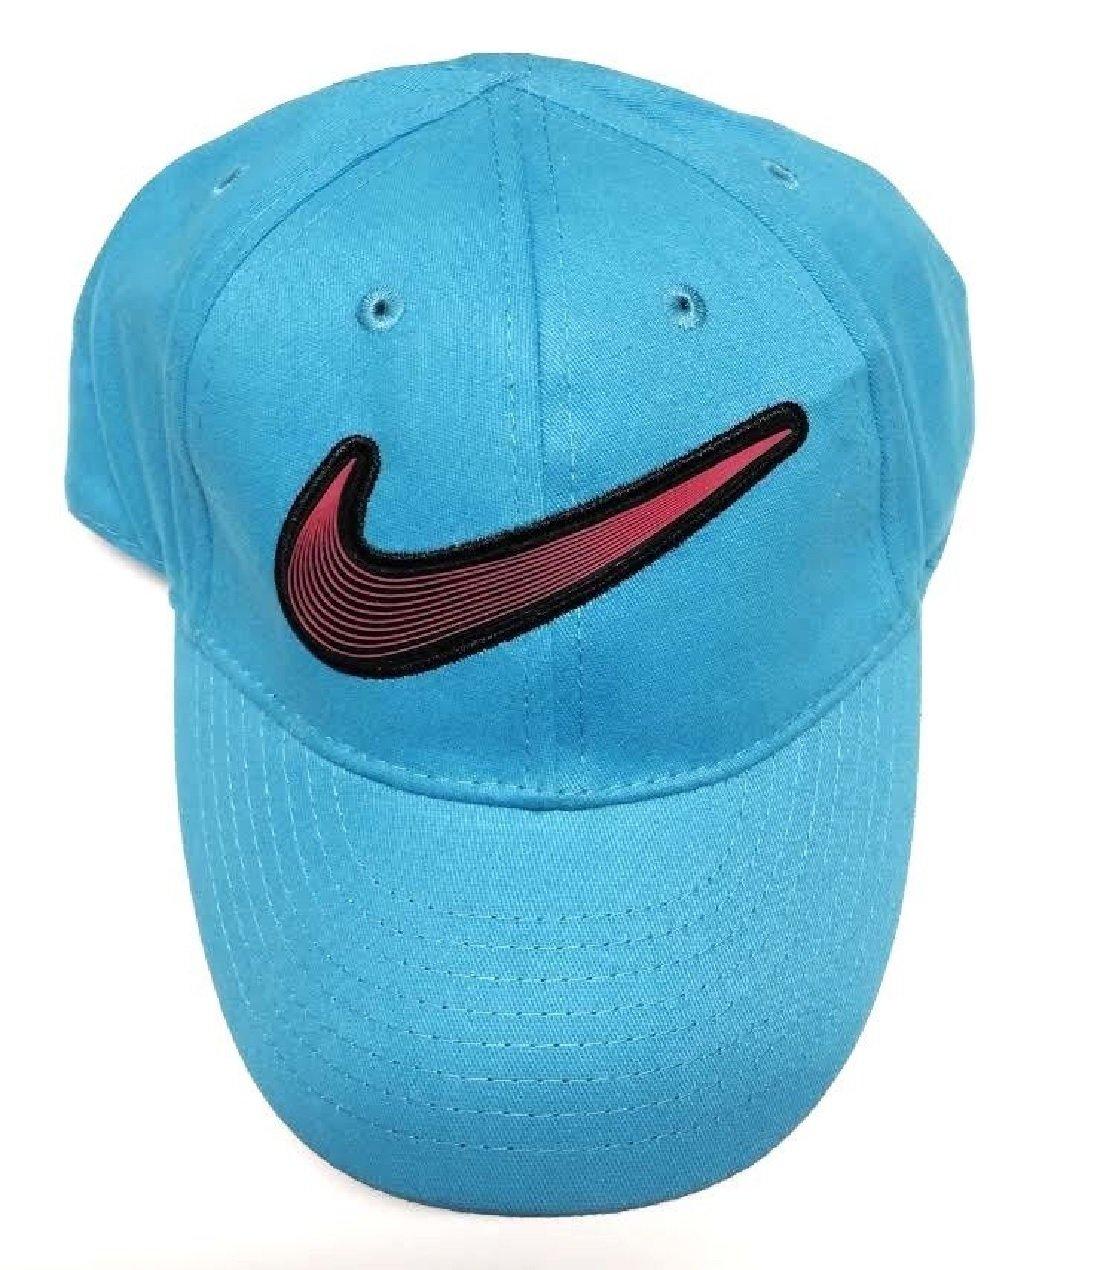 Amazon.com   Nike Baseball Cap Toddler girls Size 2 4T C Blue   Novelty  Baseball Caps   Sports   Outdoors 7309f155fa9c